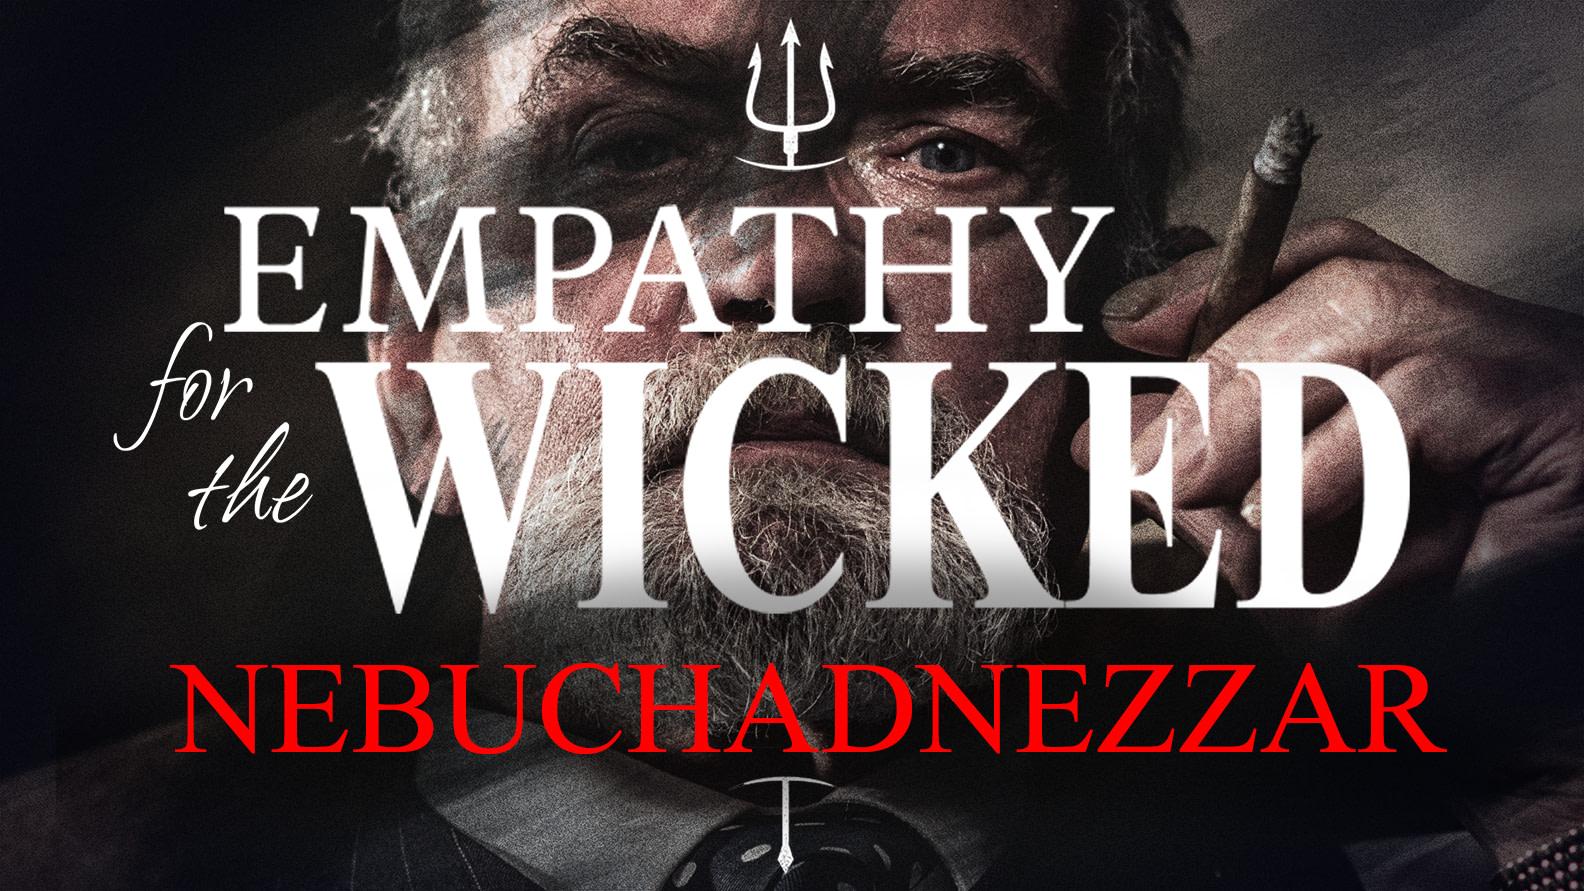 Empathy for the Wicked: NEBUCHADNEZZAR